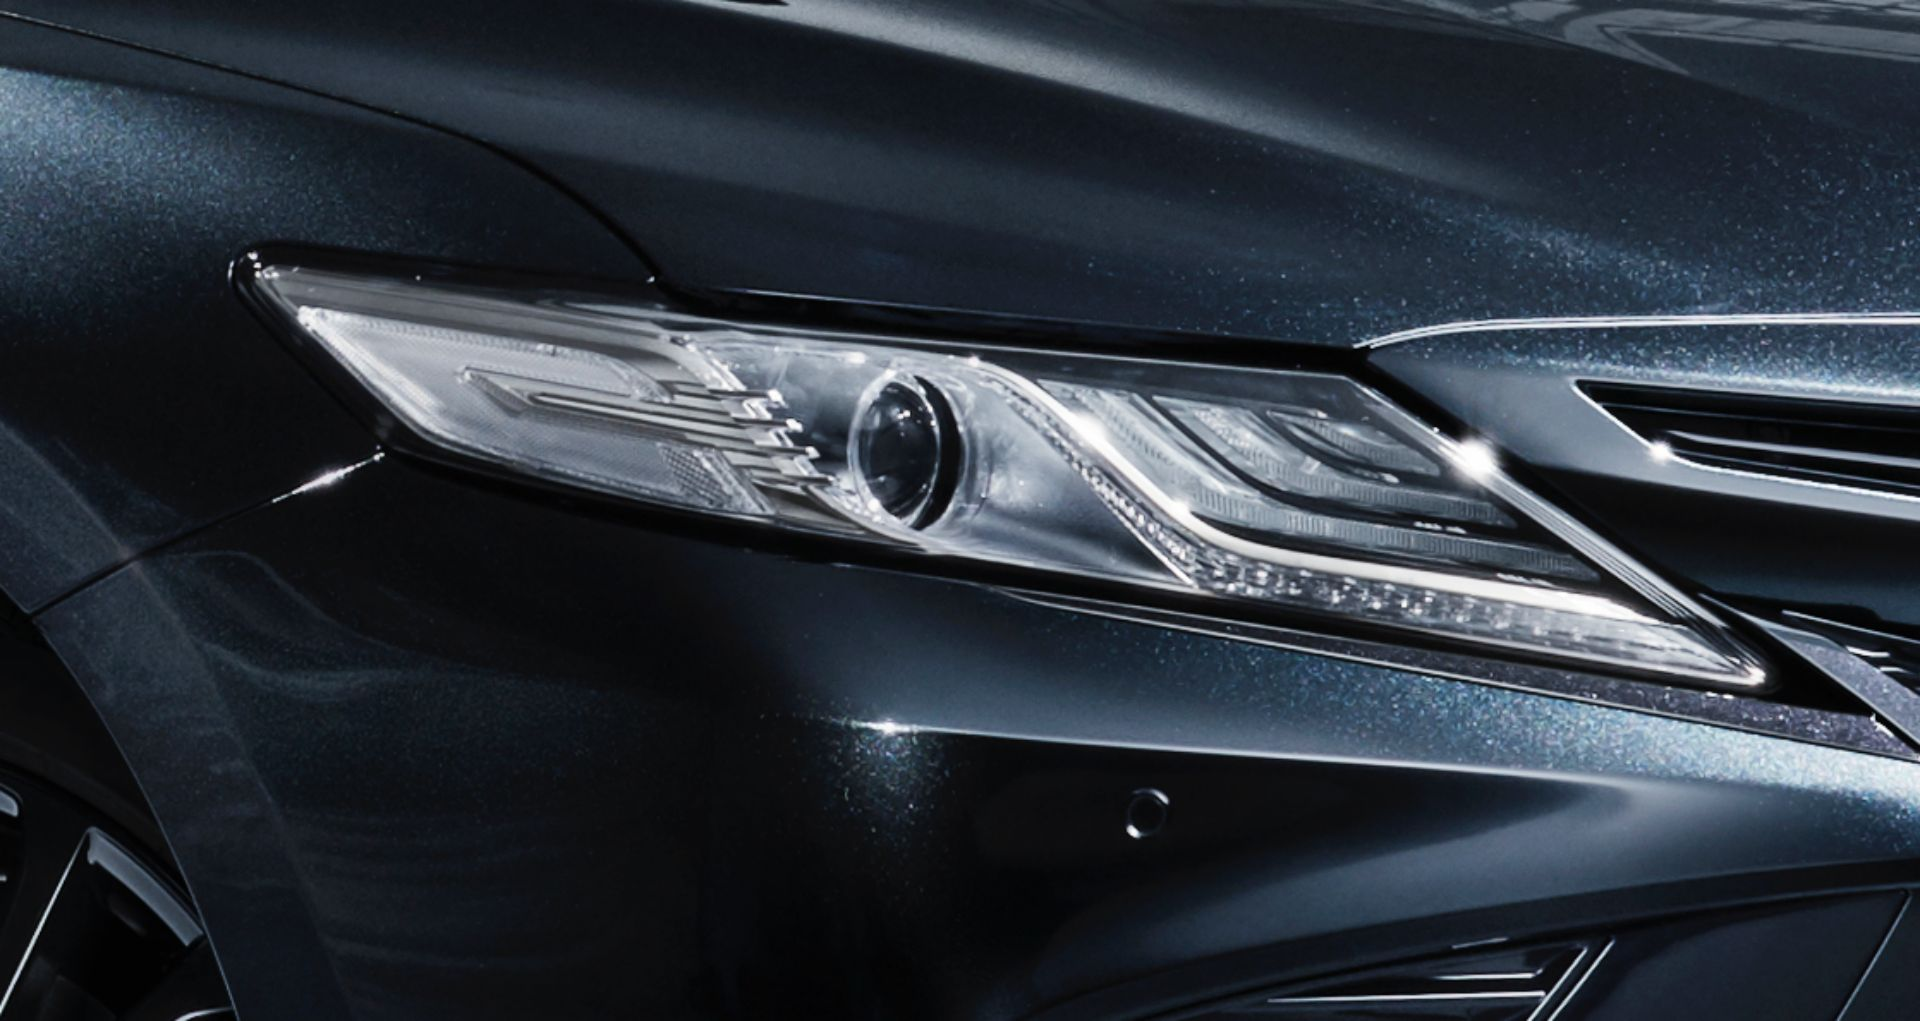 2020 Toyota Camry Black Edition JDM spec 6